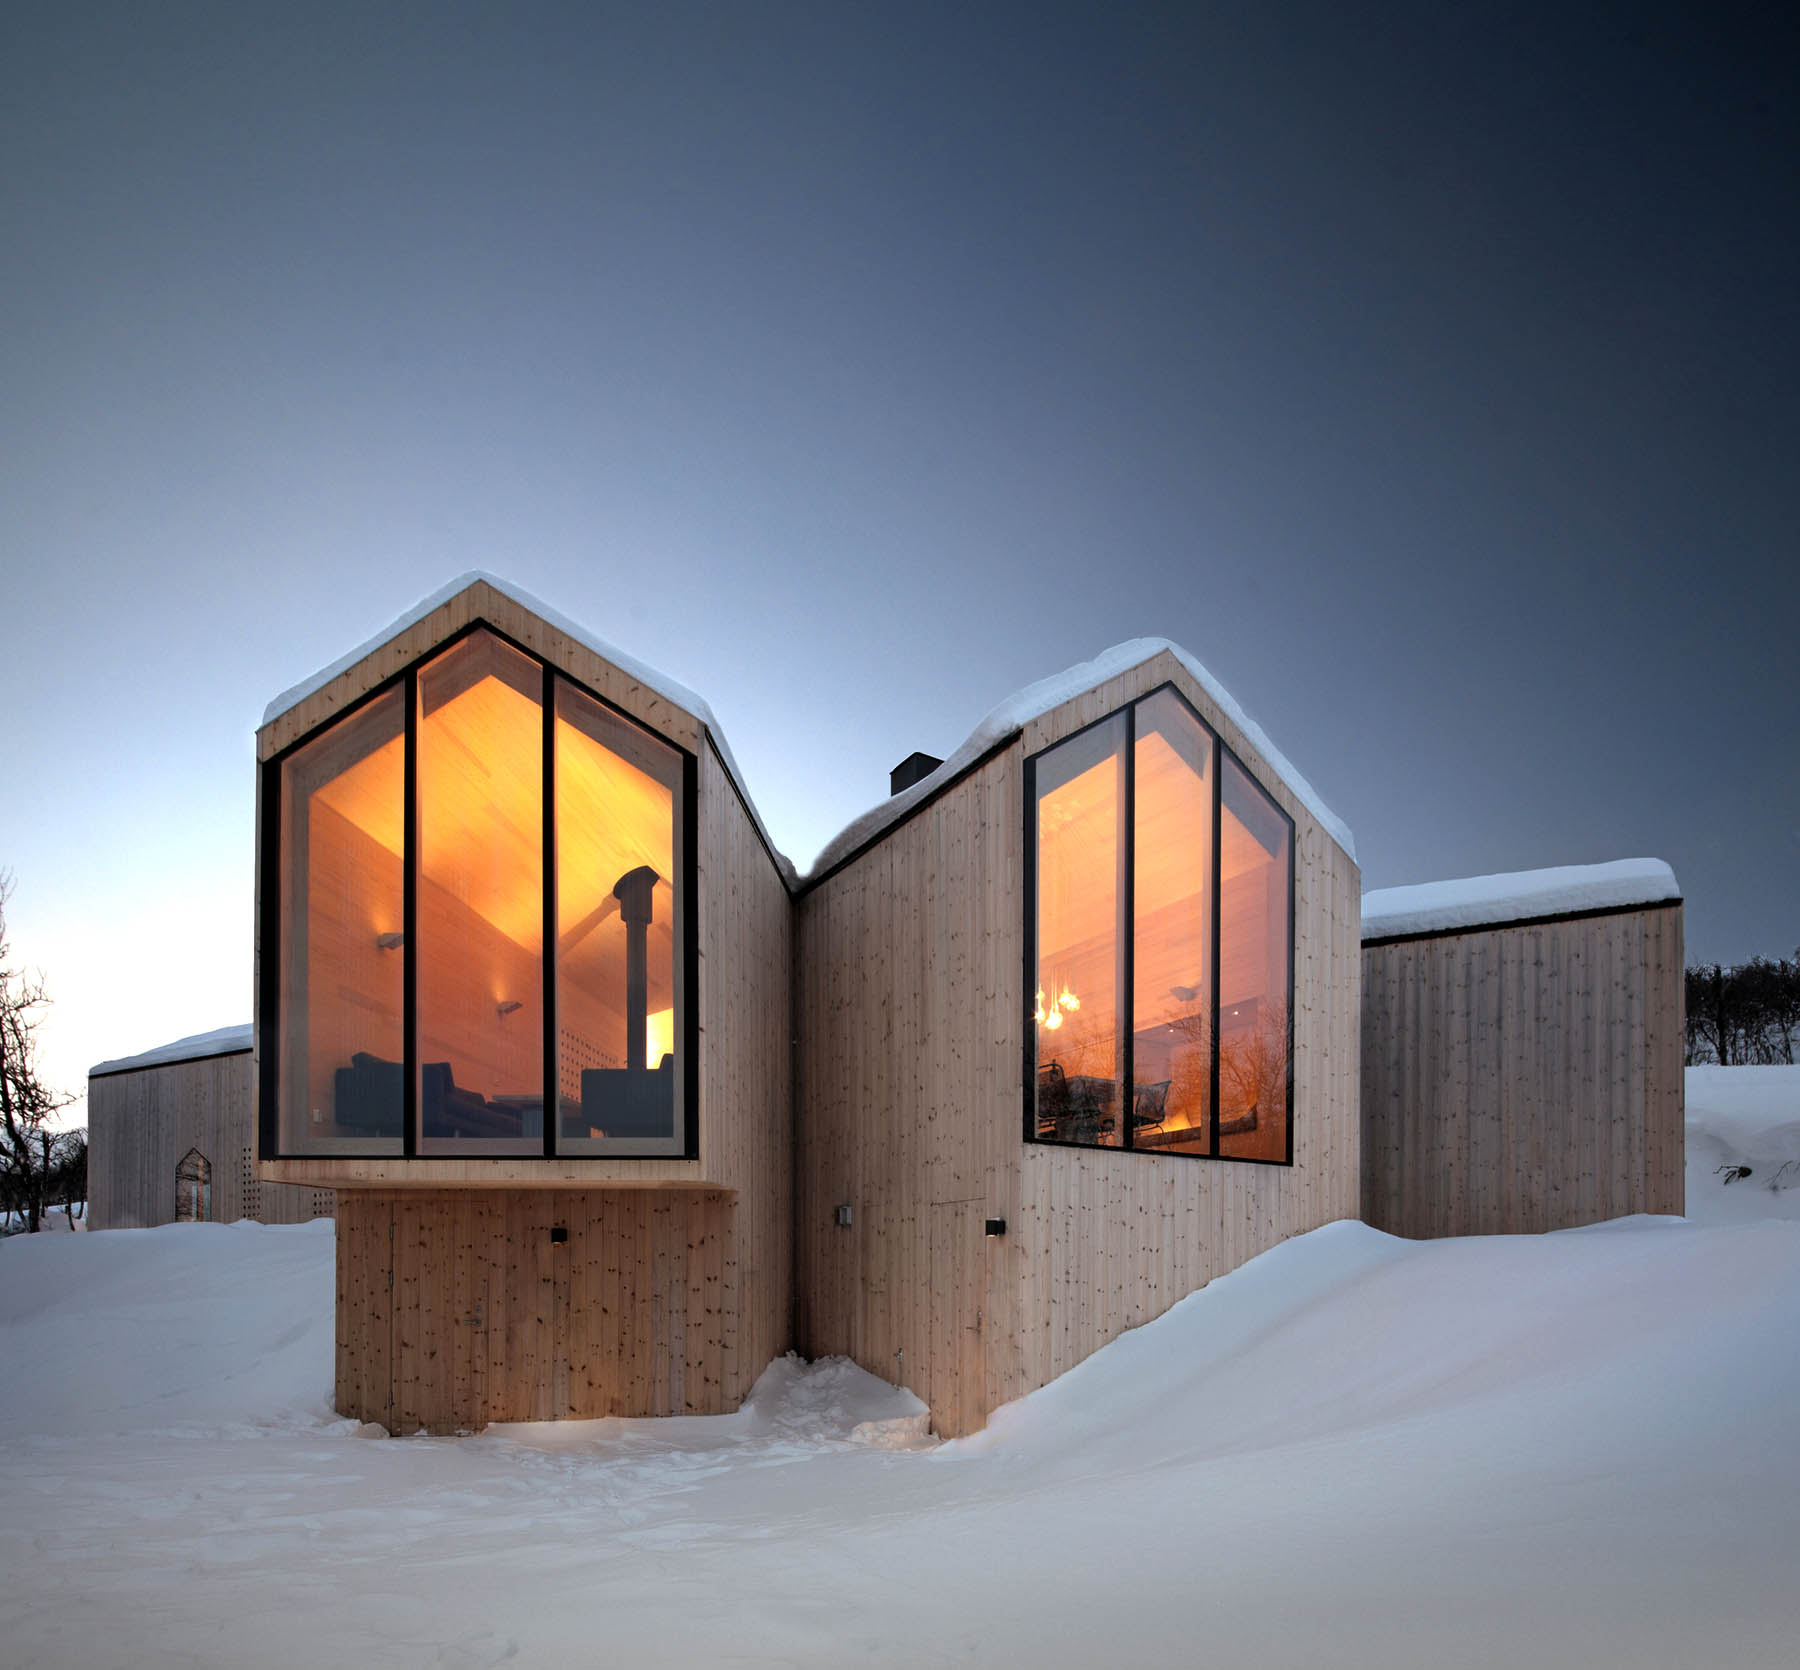 split-mountain-lodge-norway